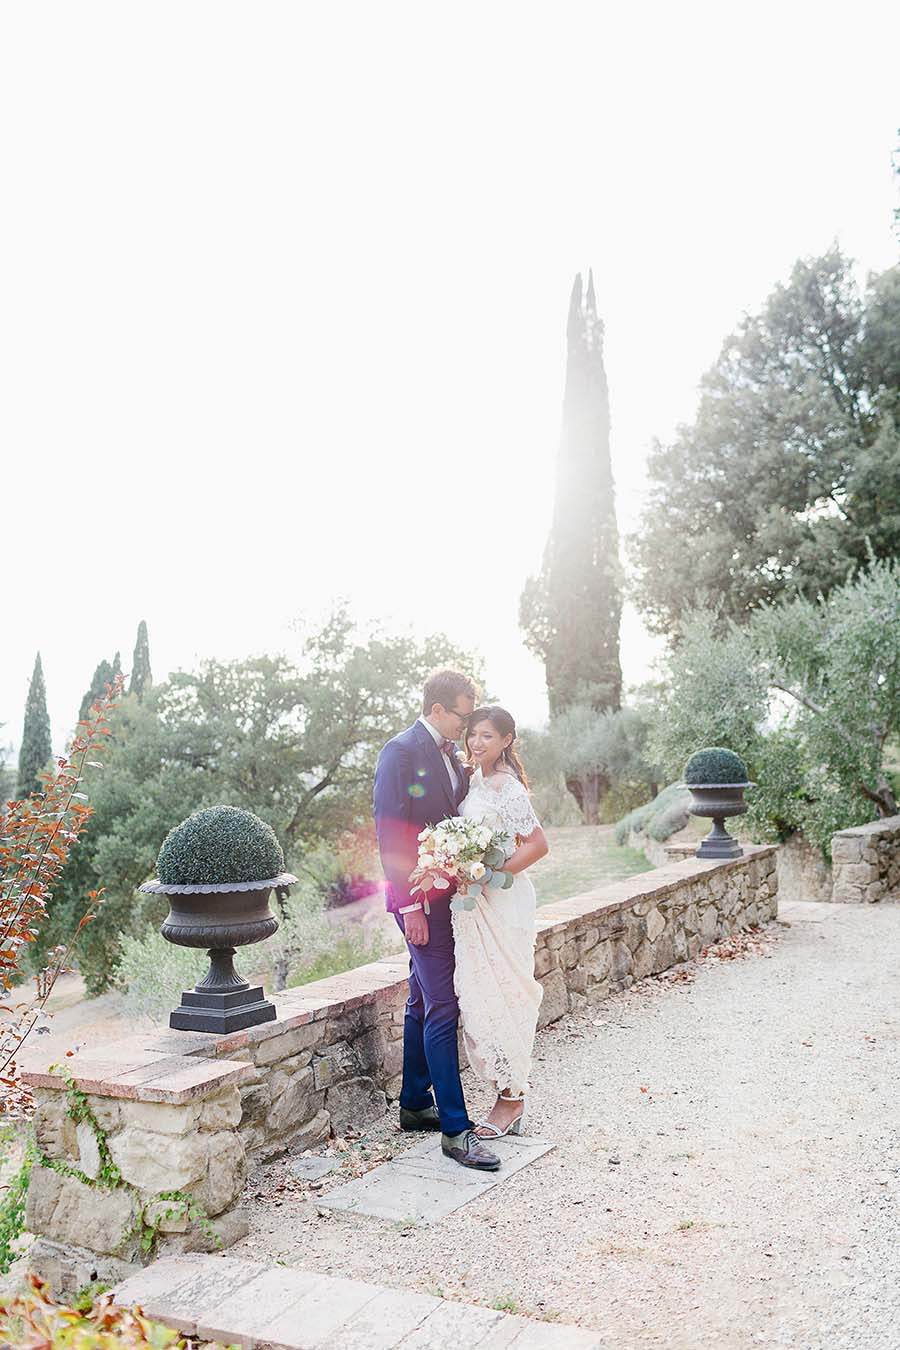 villa-le-fontanelle-wedding-photographer-ilaria-petrucci-marco-severine-548